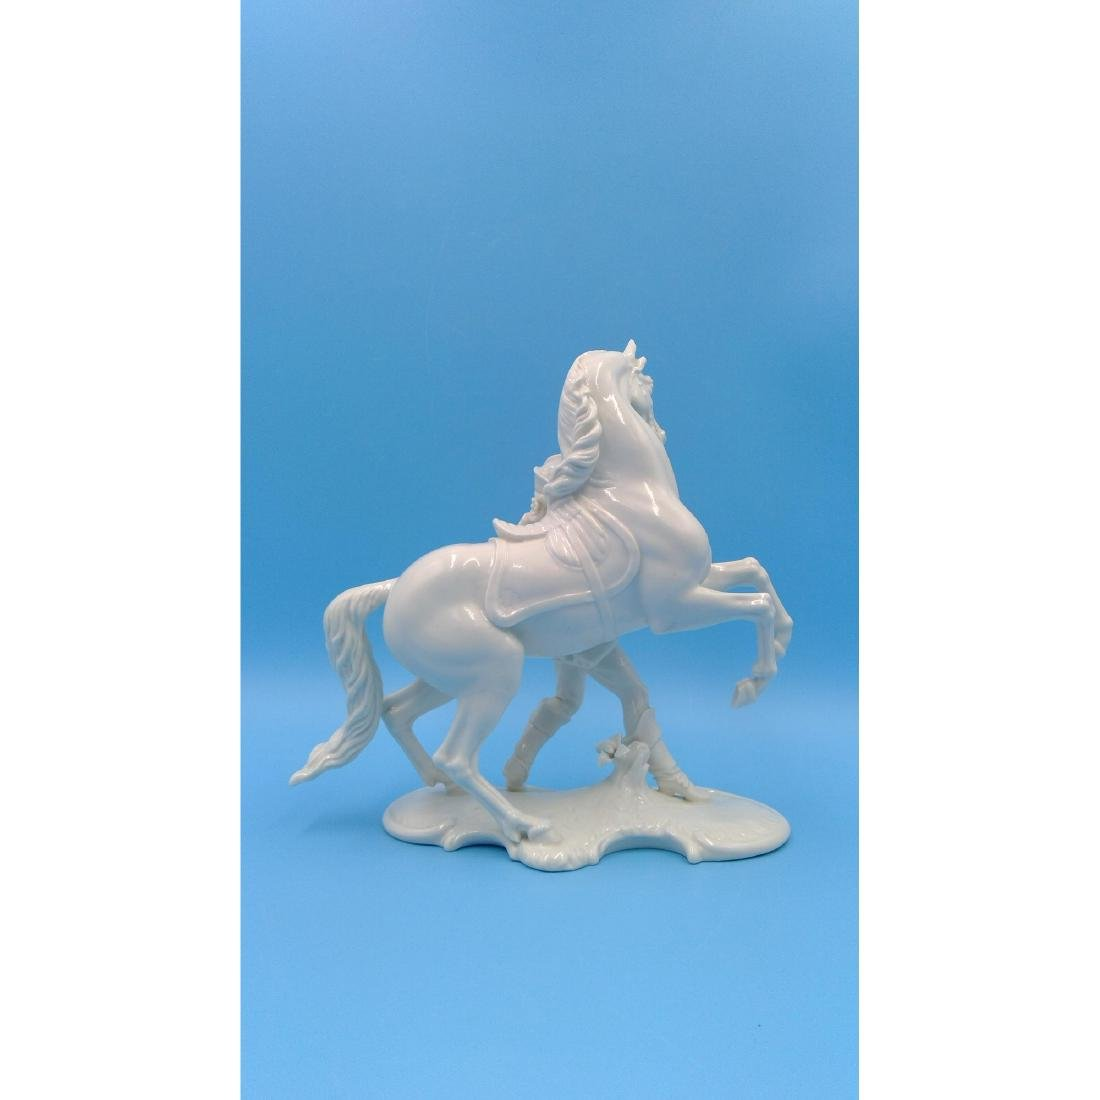 NYMPHENBURG GERMAN PORCELAIN FIGURINE HORSE RIDER - 3